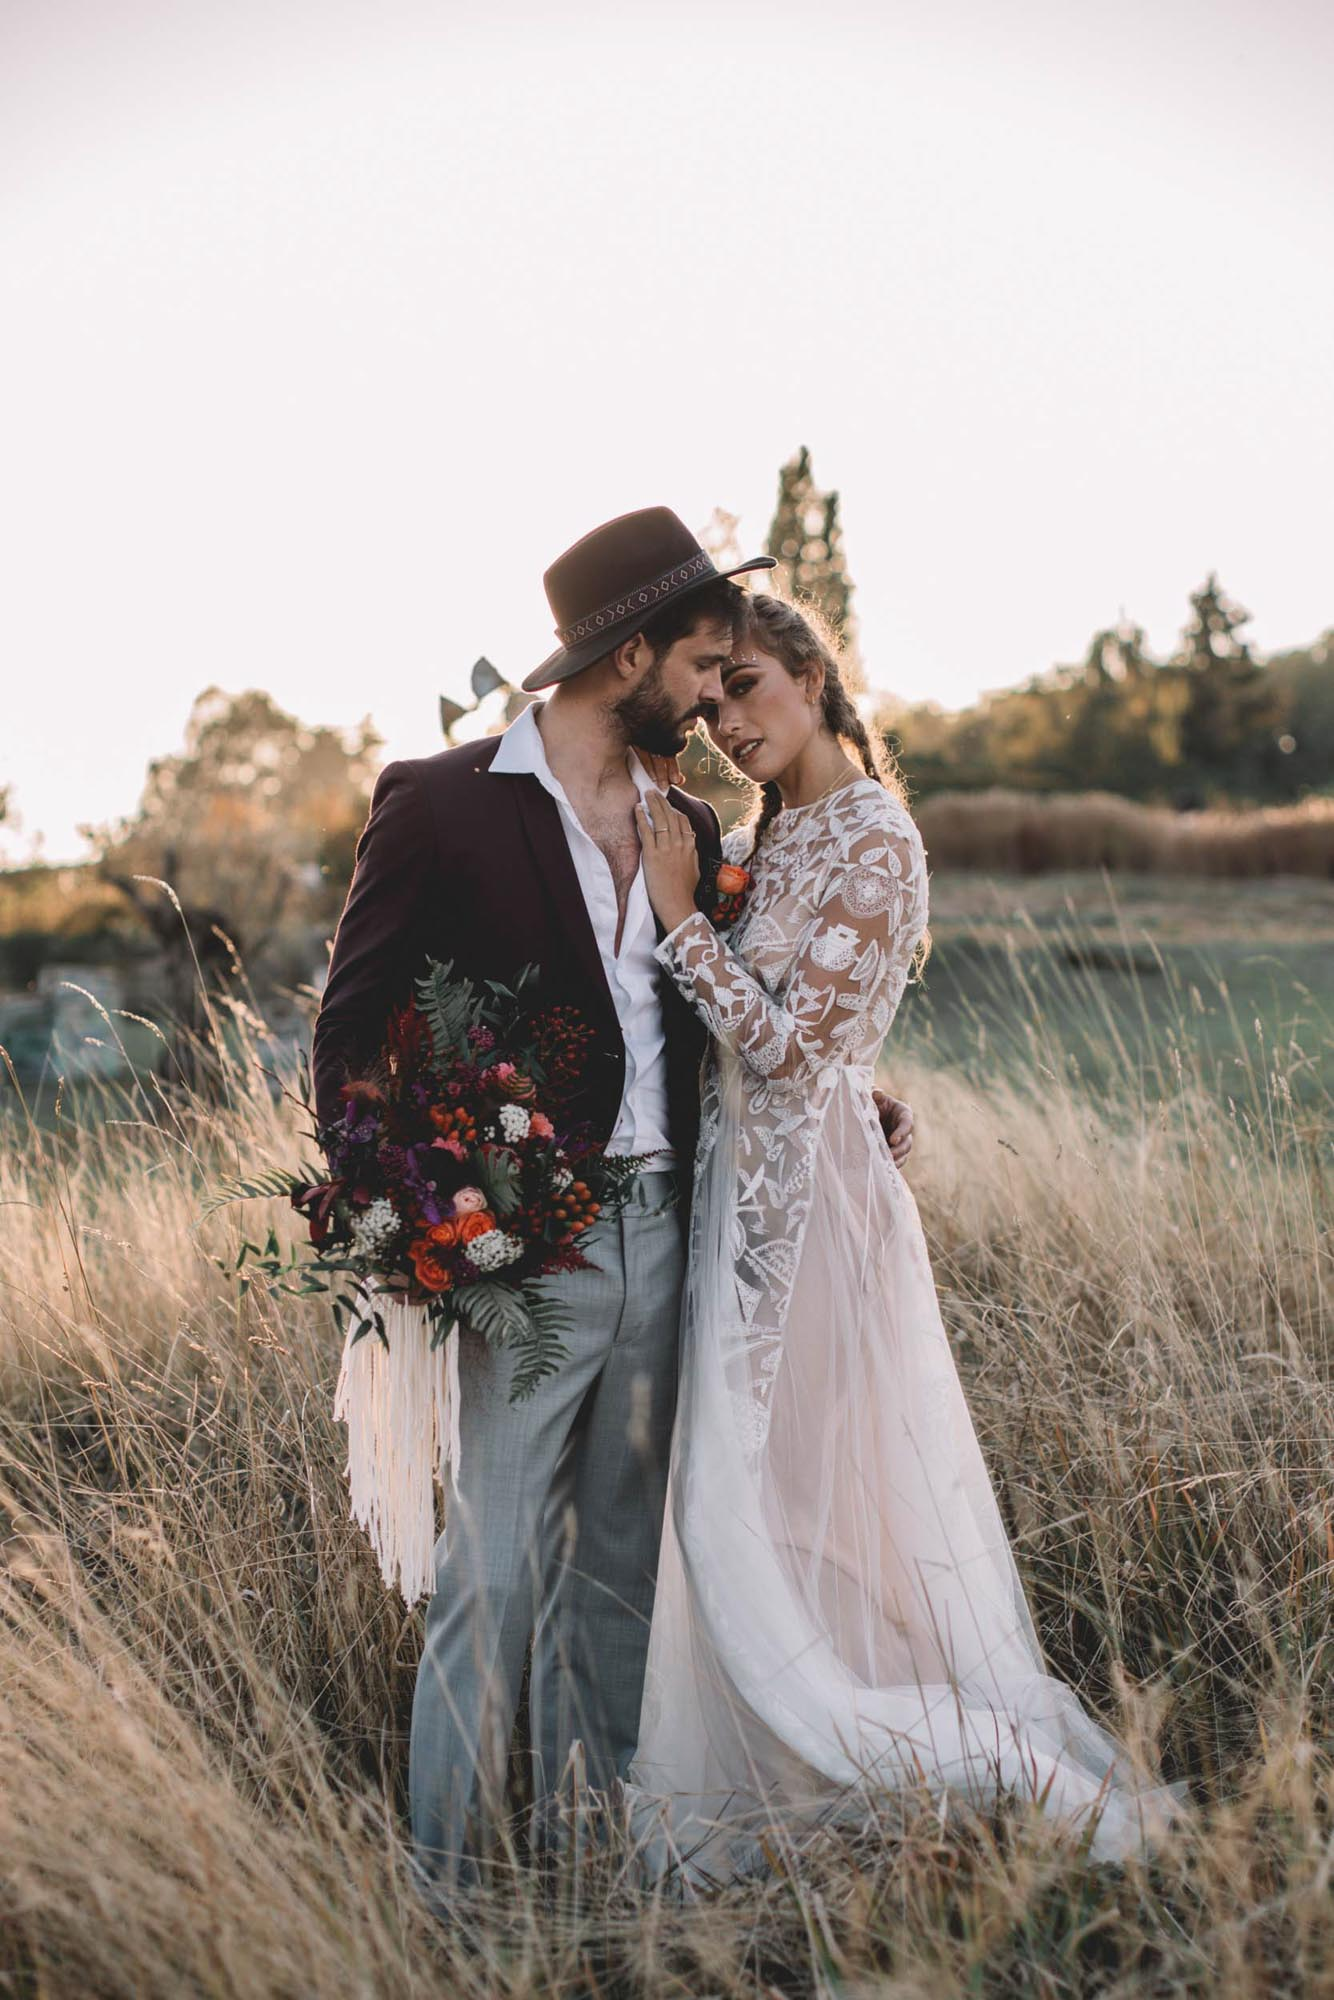 COACHELLA_LES BONNES JOIES_PHOTOGRAPHE_MARIAGE_LES BANDITS-5